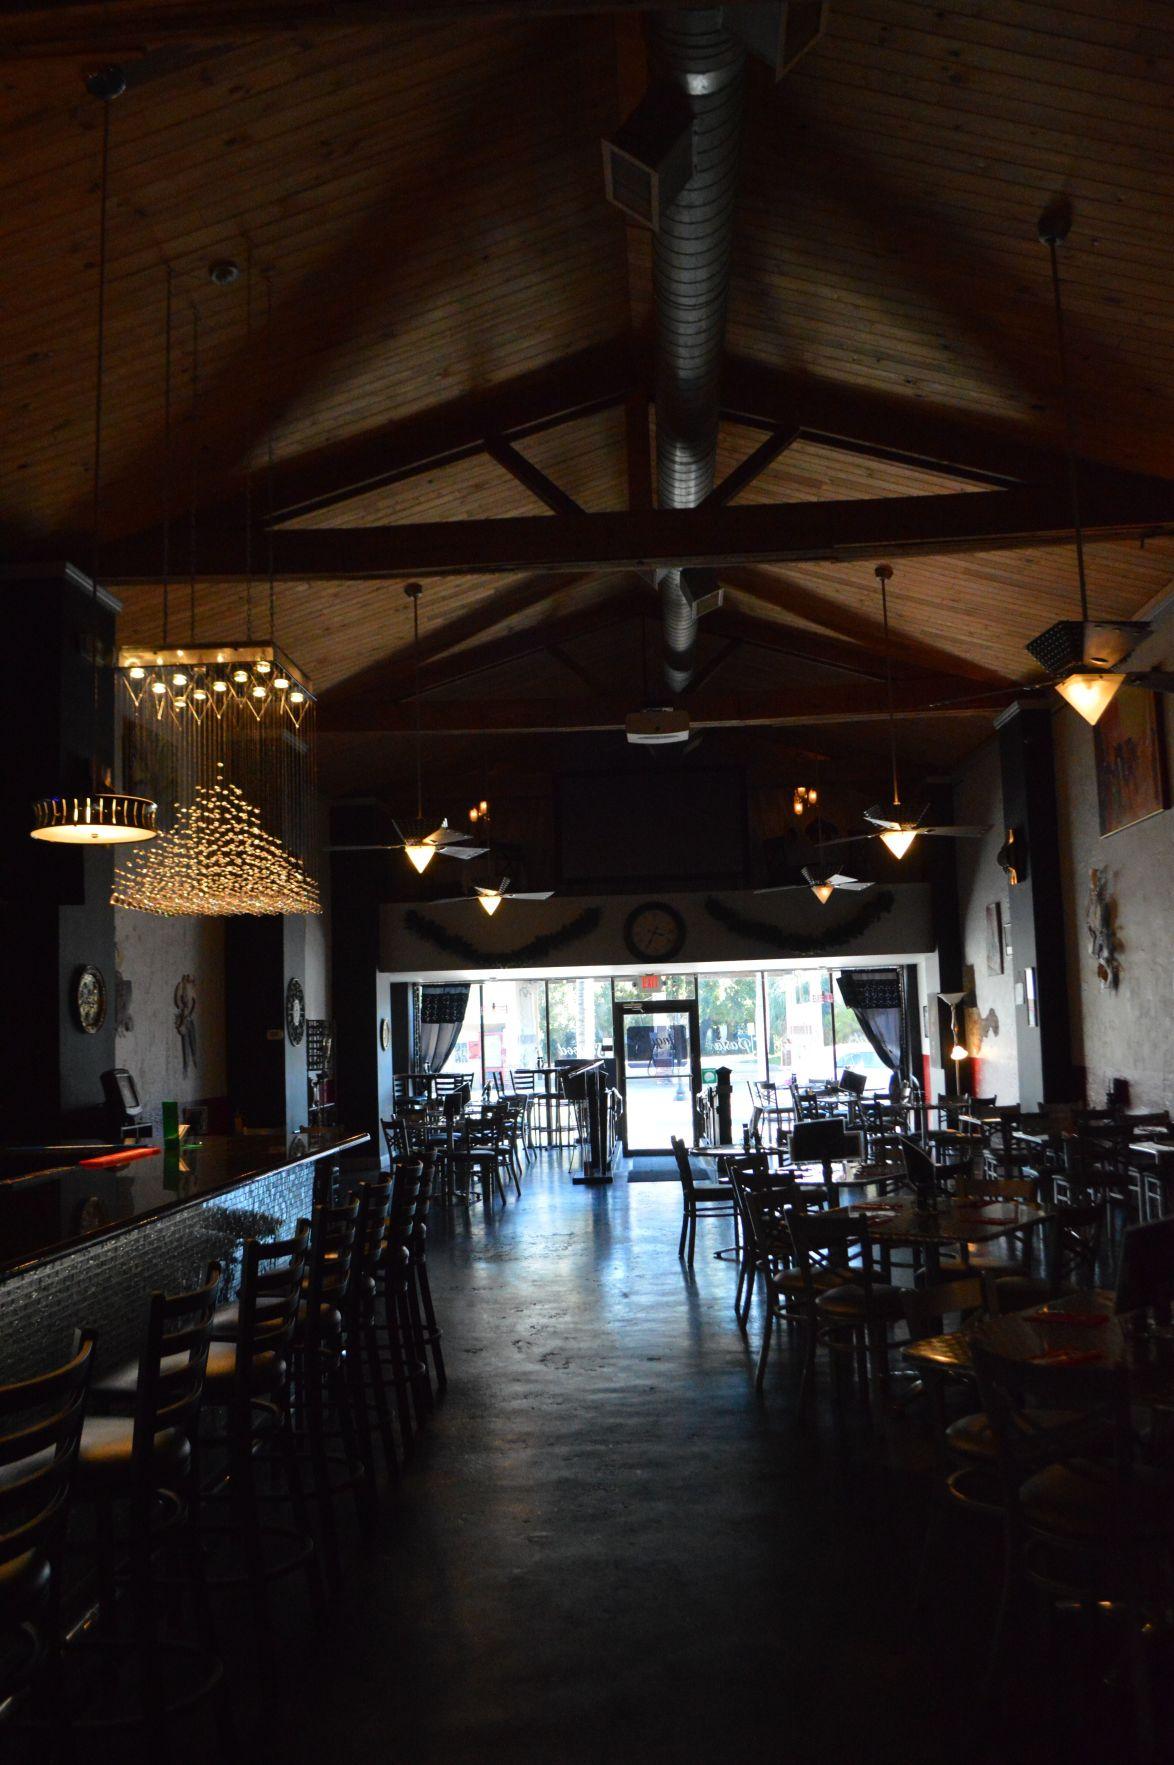 Angela's restaurant, a Buffalo-inspired eatery